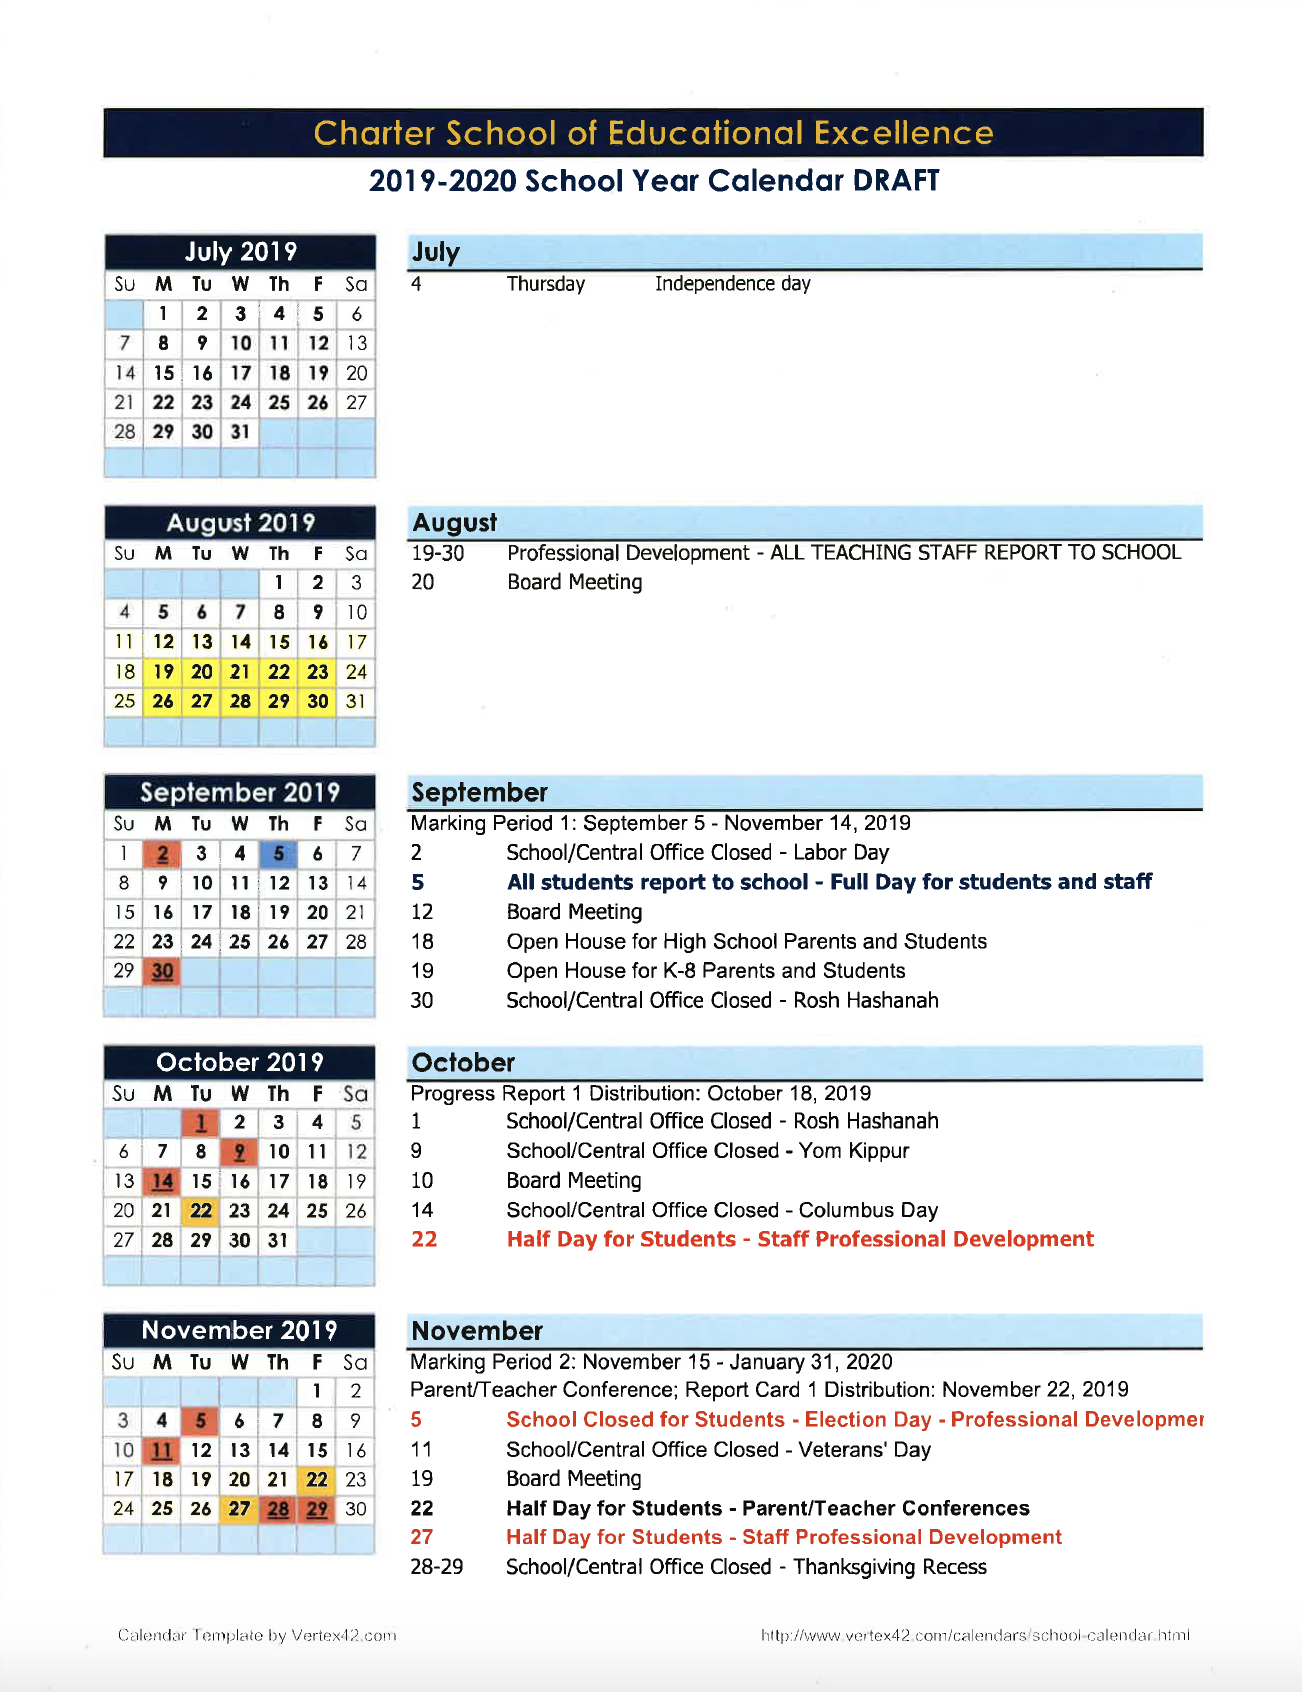 Academic Calendar   The City College Of New York Regarding Regarding Turningstone Bingo Schedule Feb 2020